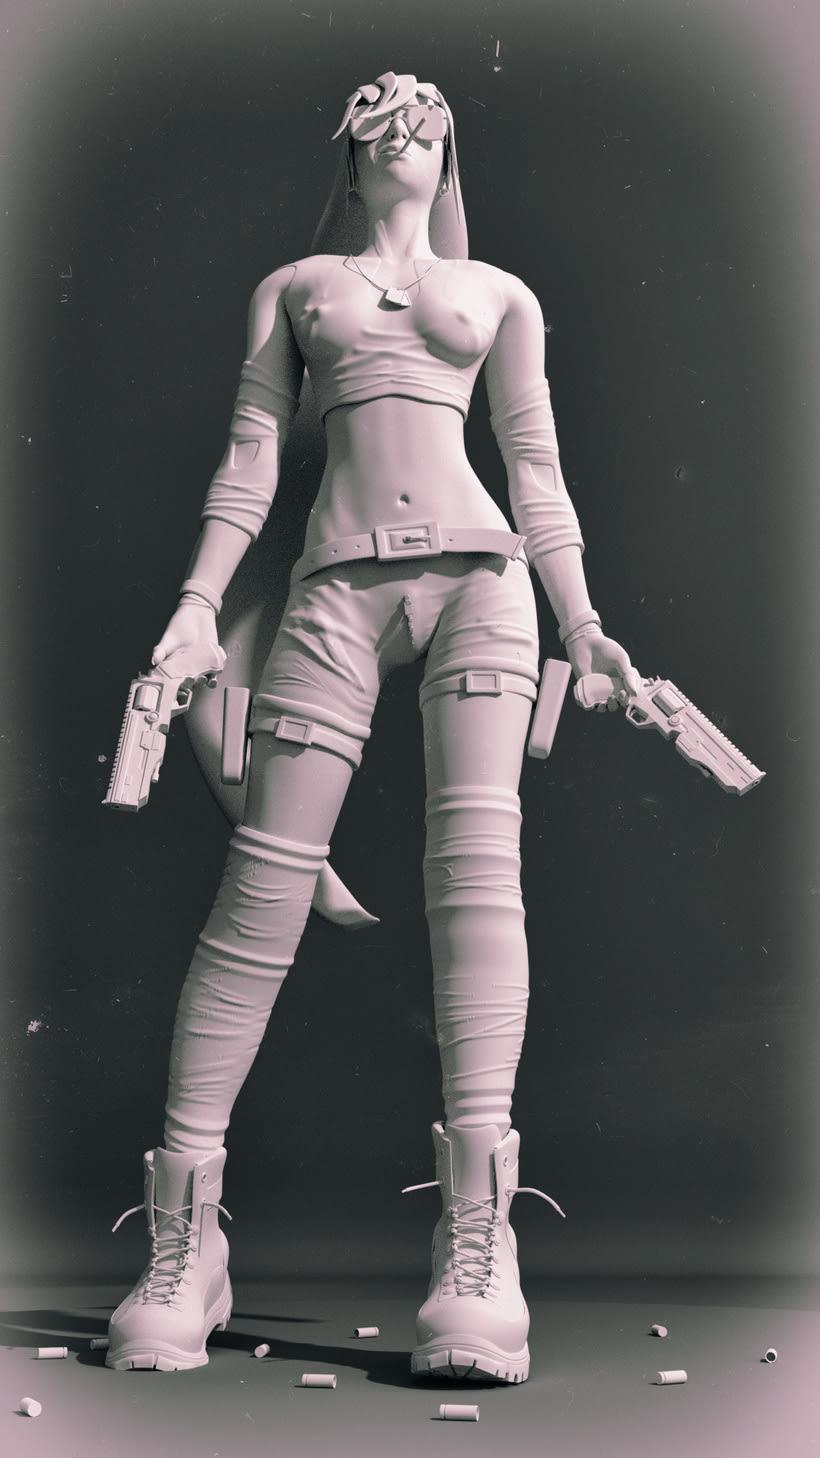 Blender Sculpt - GunGirl 1